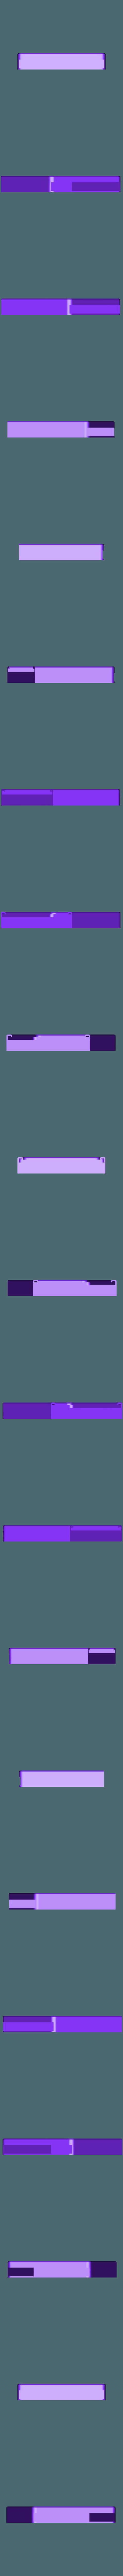 sFanHolder2.stl Download free STL file Fumey The Fume Extractor • 3D printer object, Adafruit